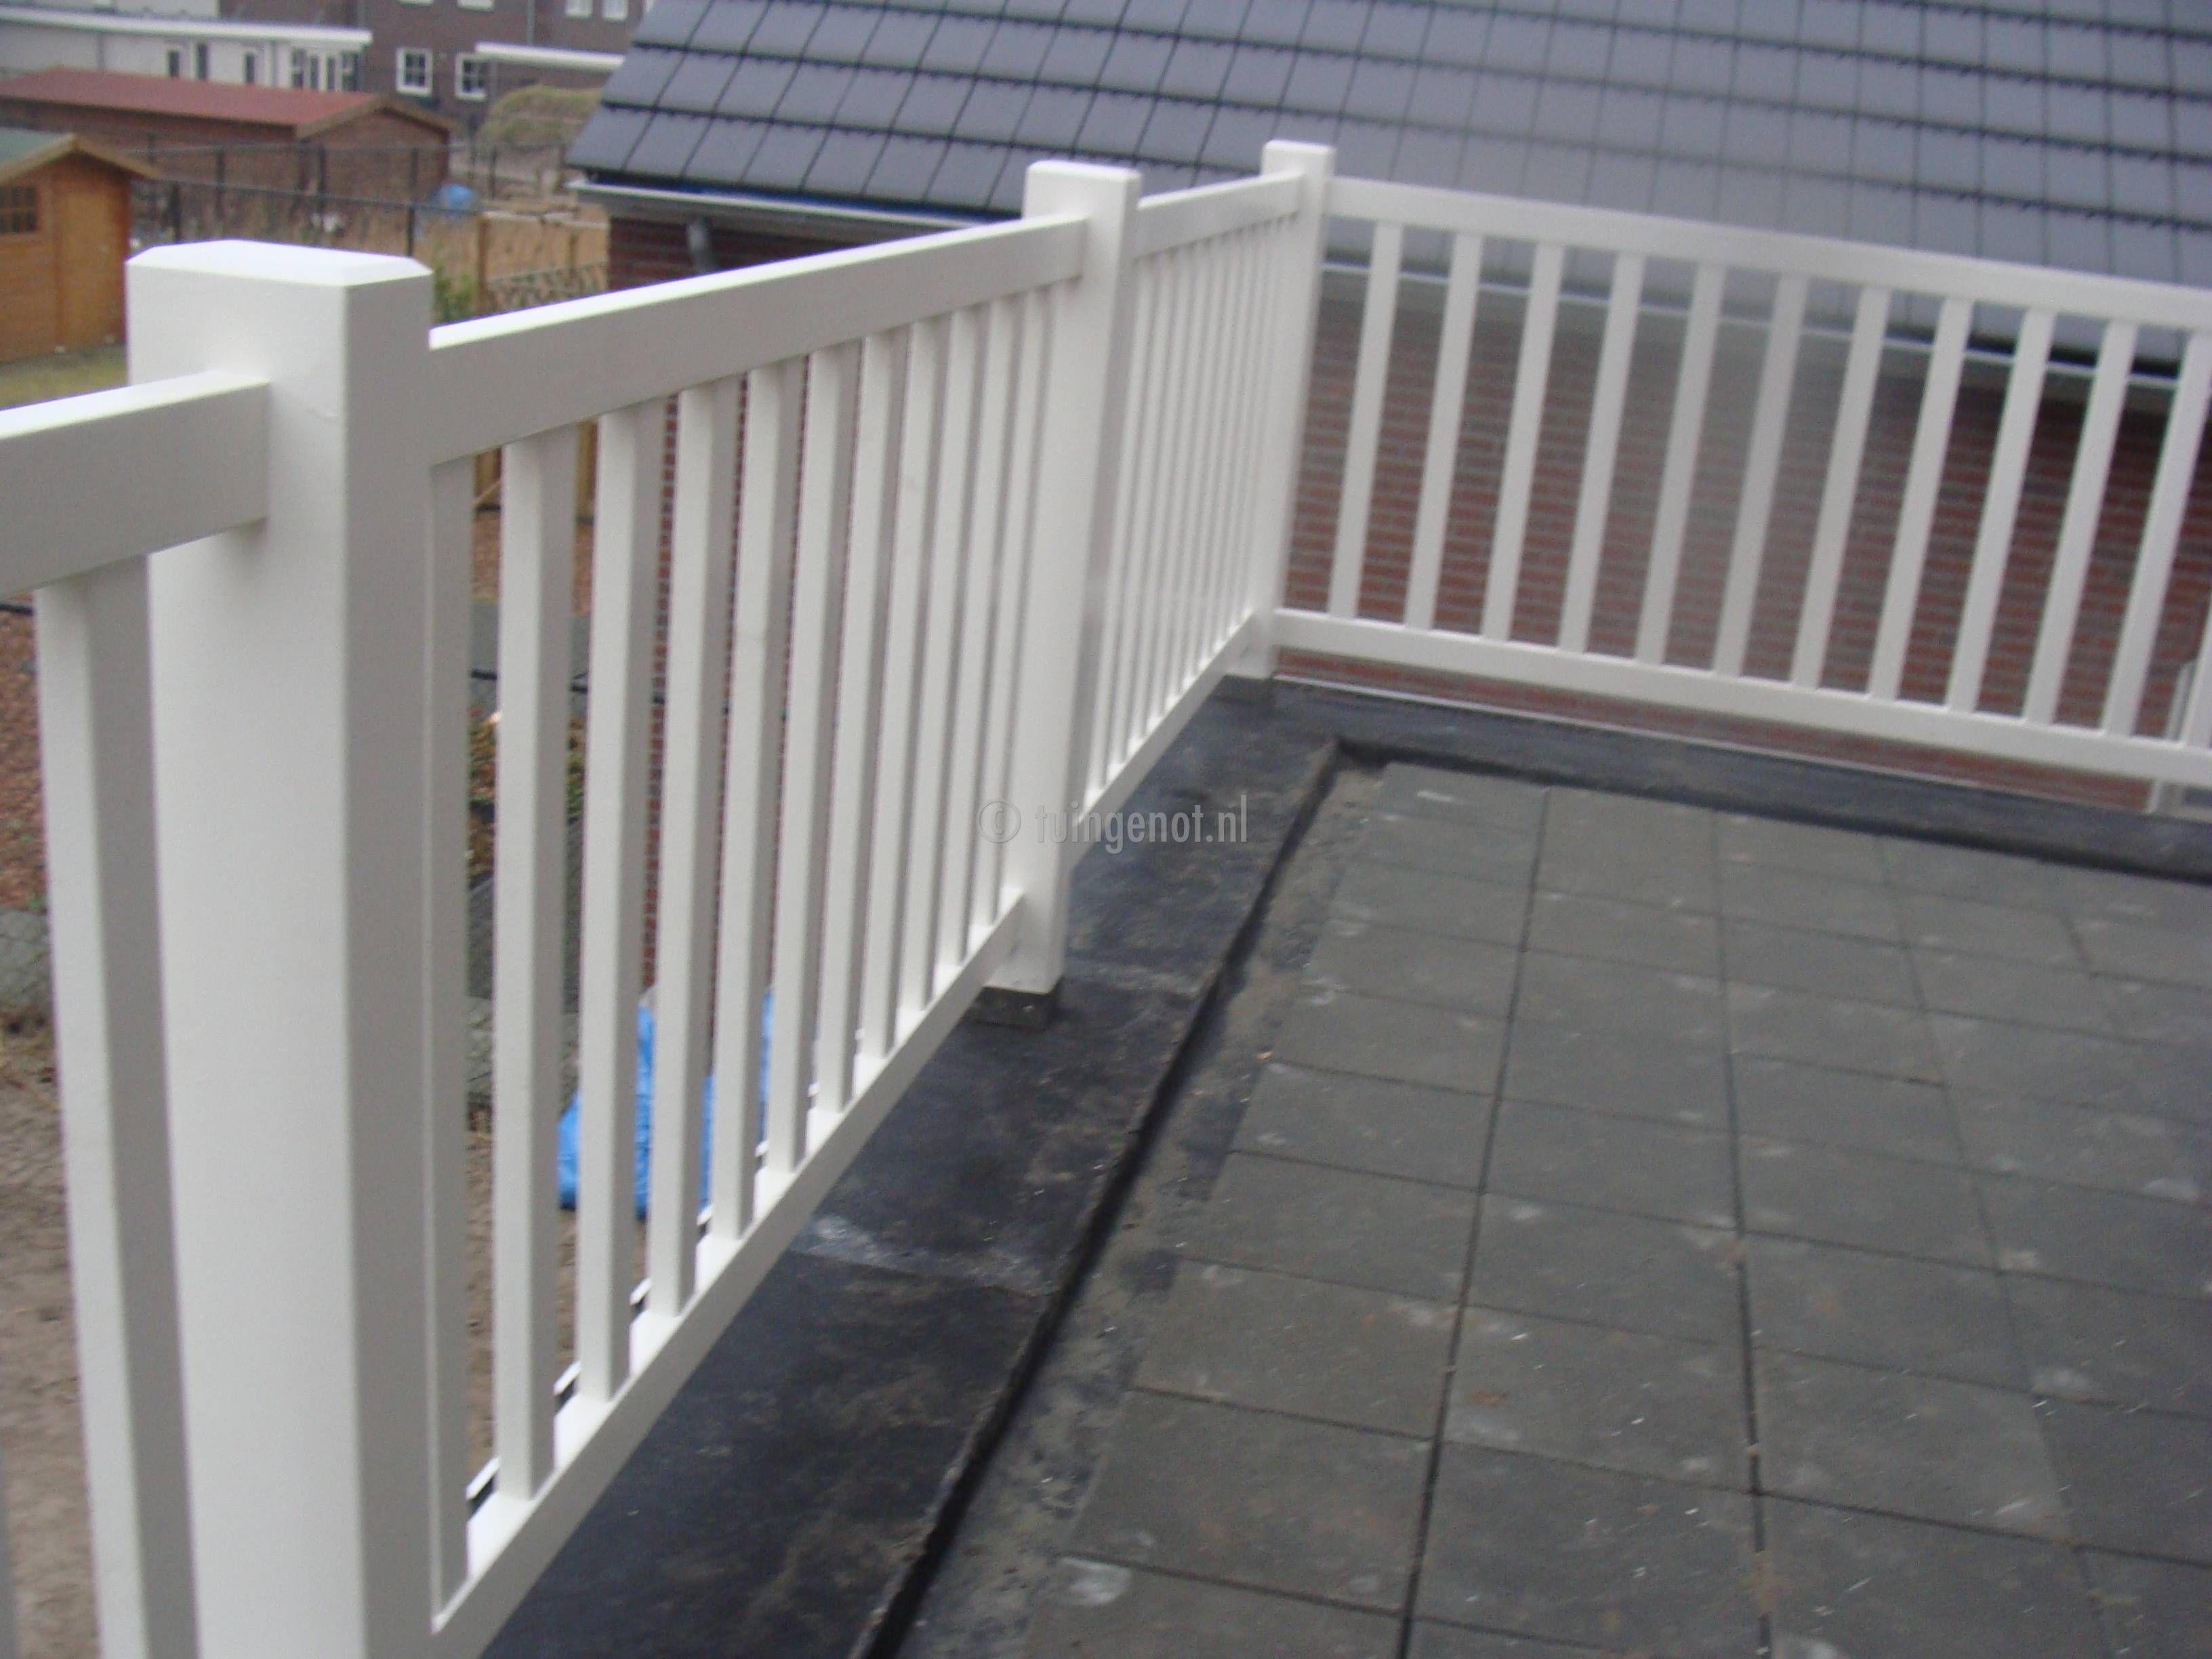 Houten balustrade terras google search tuin pinterest balconies - Terras hout ...